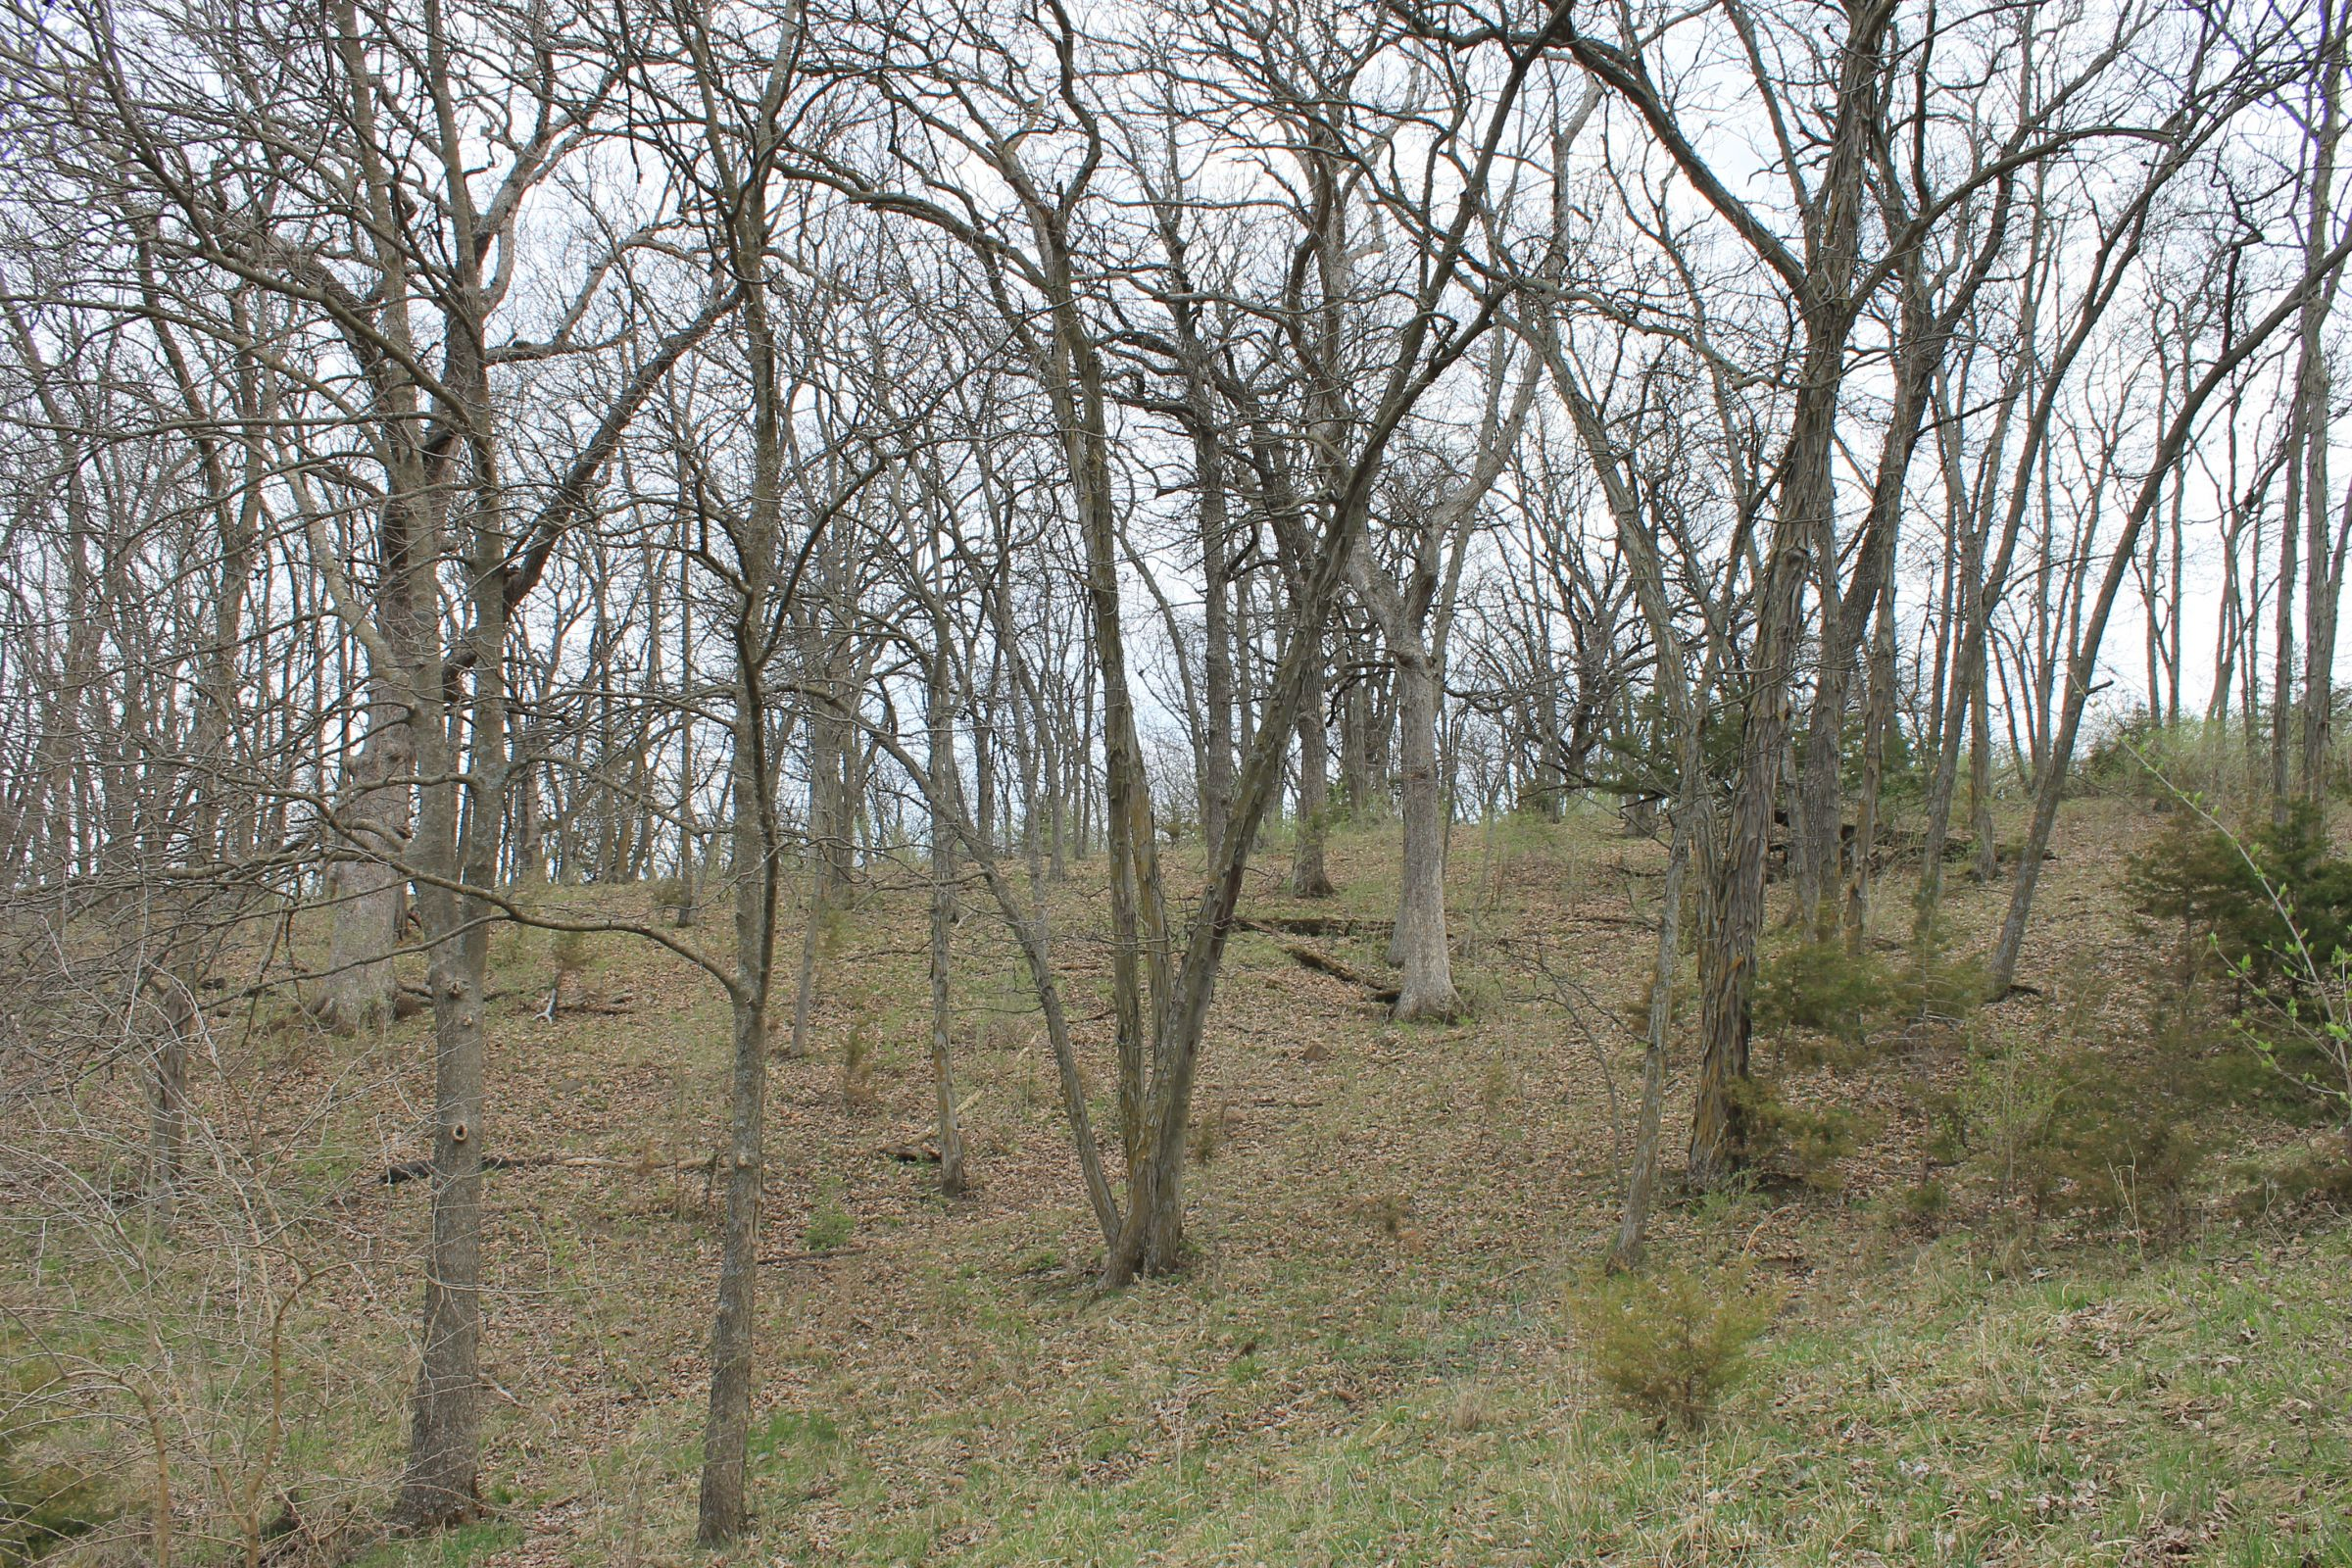 land-warren-county-iowa-186-acres-listing-number-15447-3-2021-04-09-153304.JPG